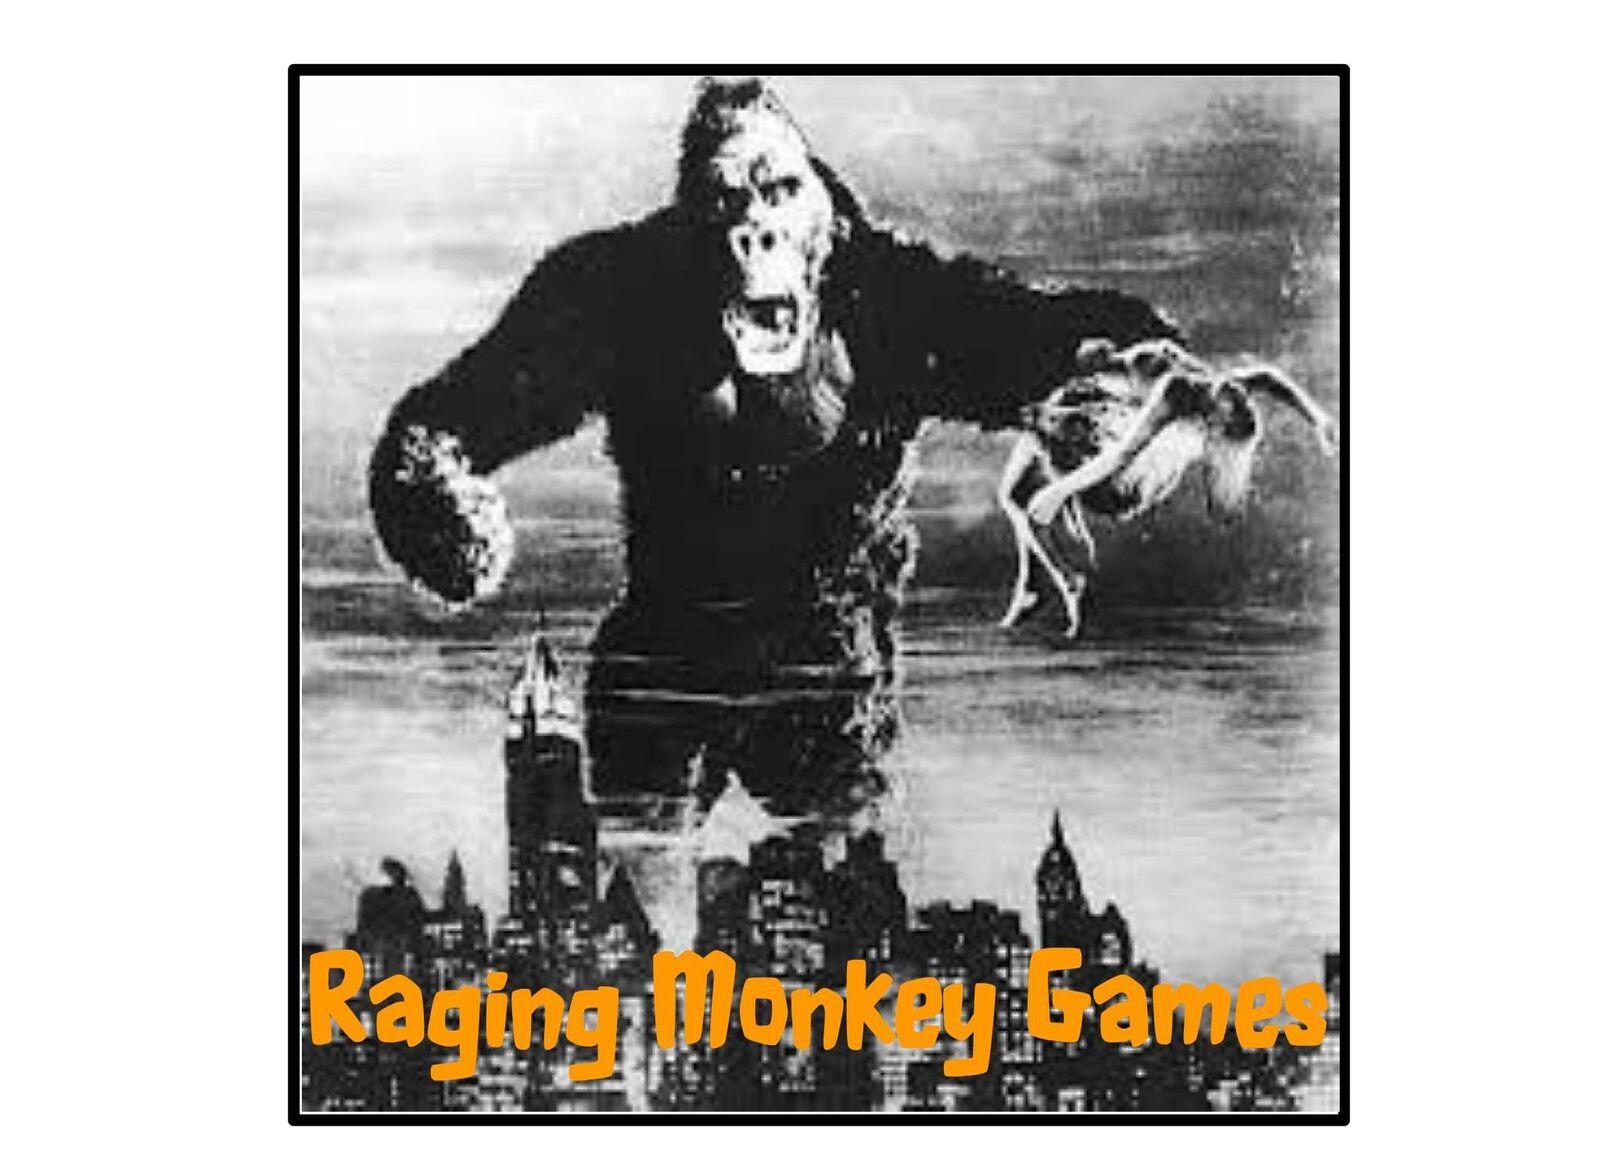 Raging Monkey Games